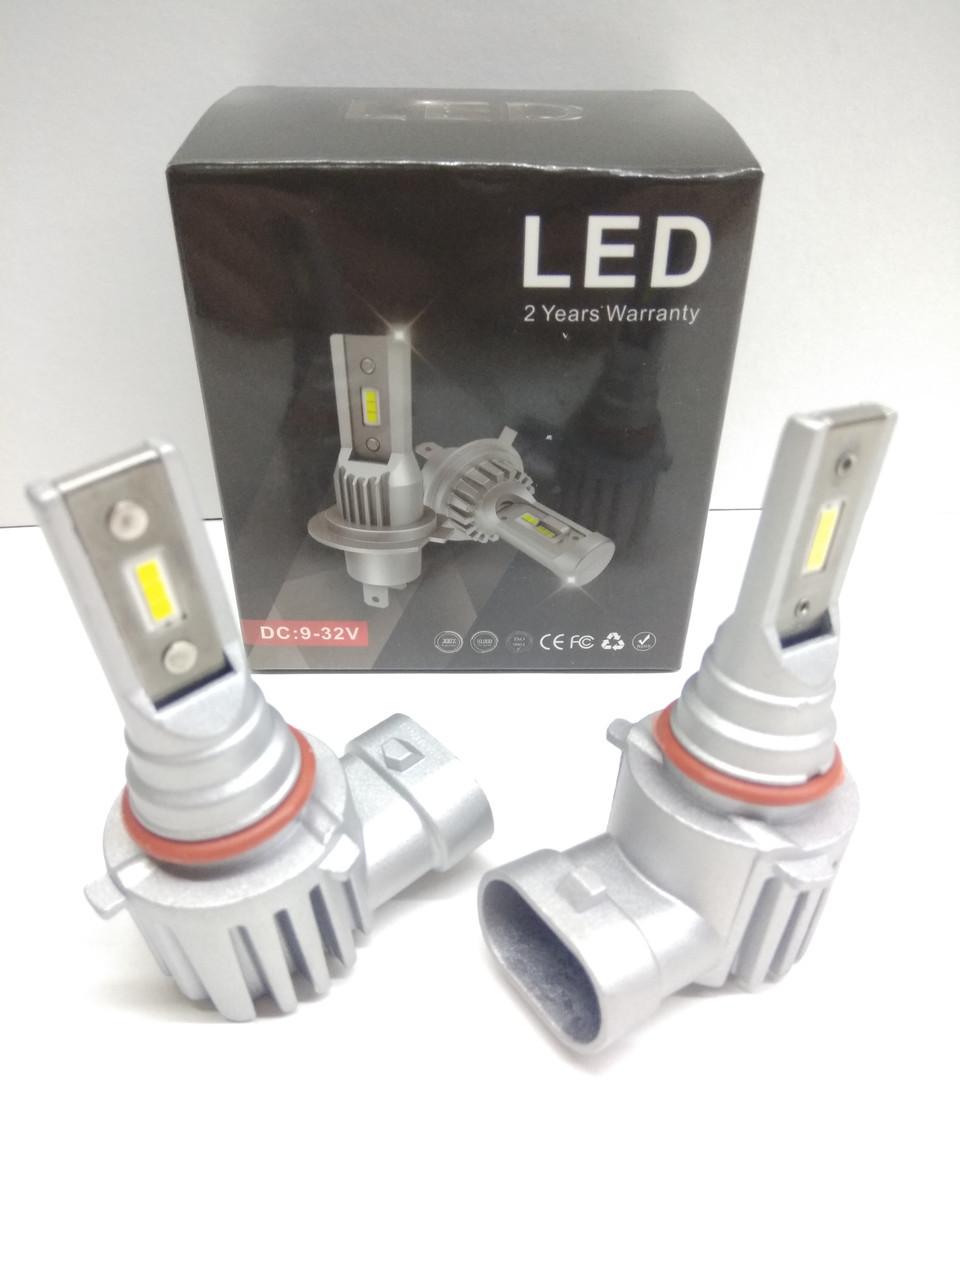 Автолампы LED S10P диод CSP Южная Корея, H10, 8000LM, 30W, 12-24V